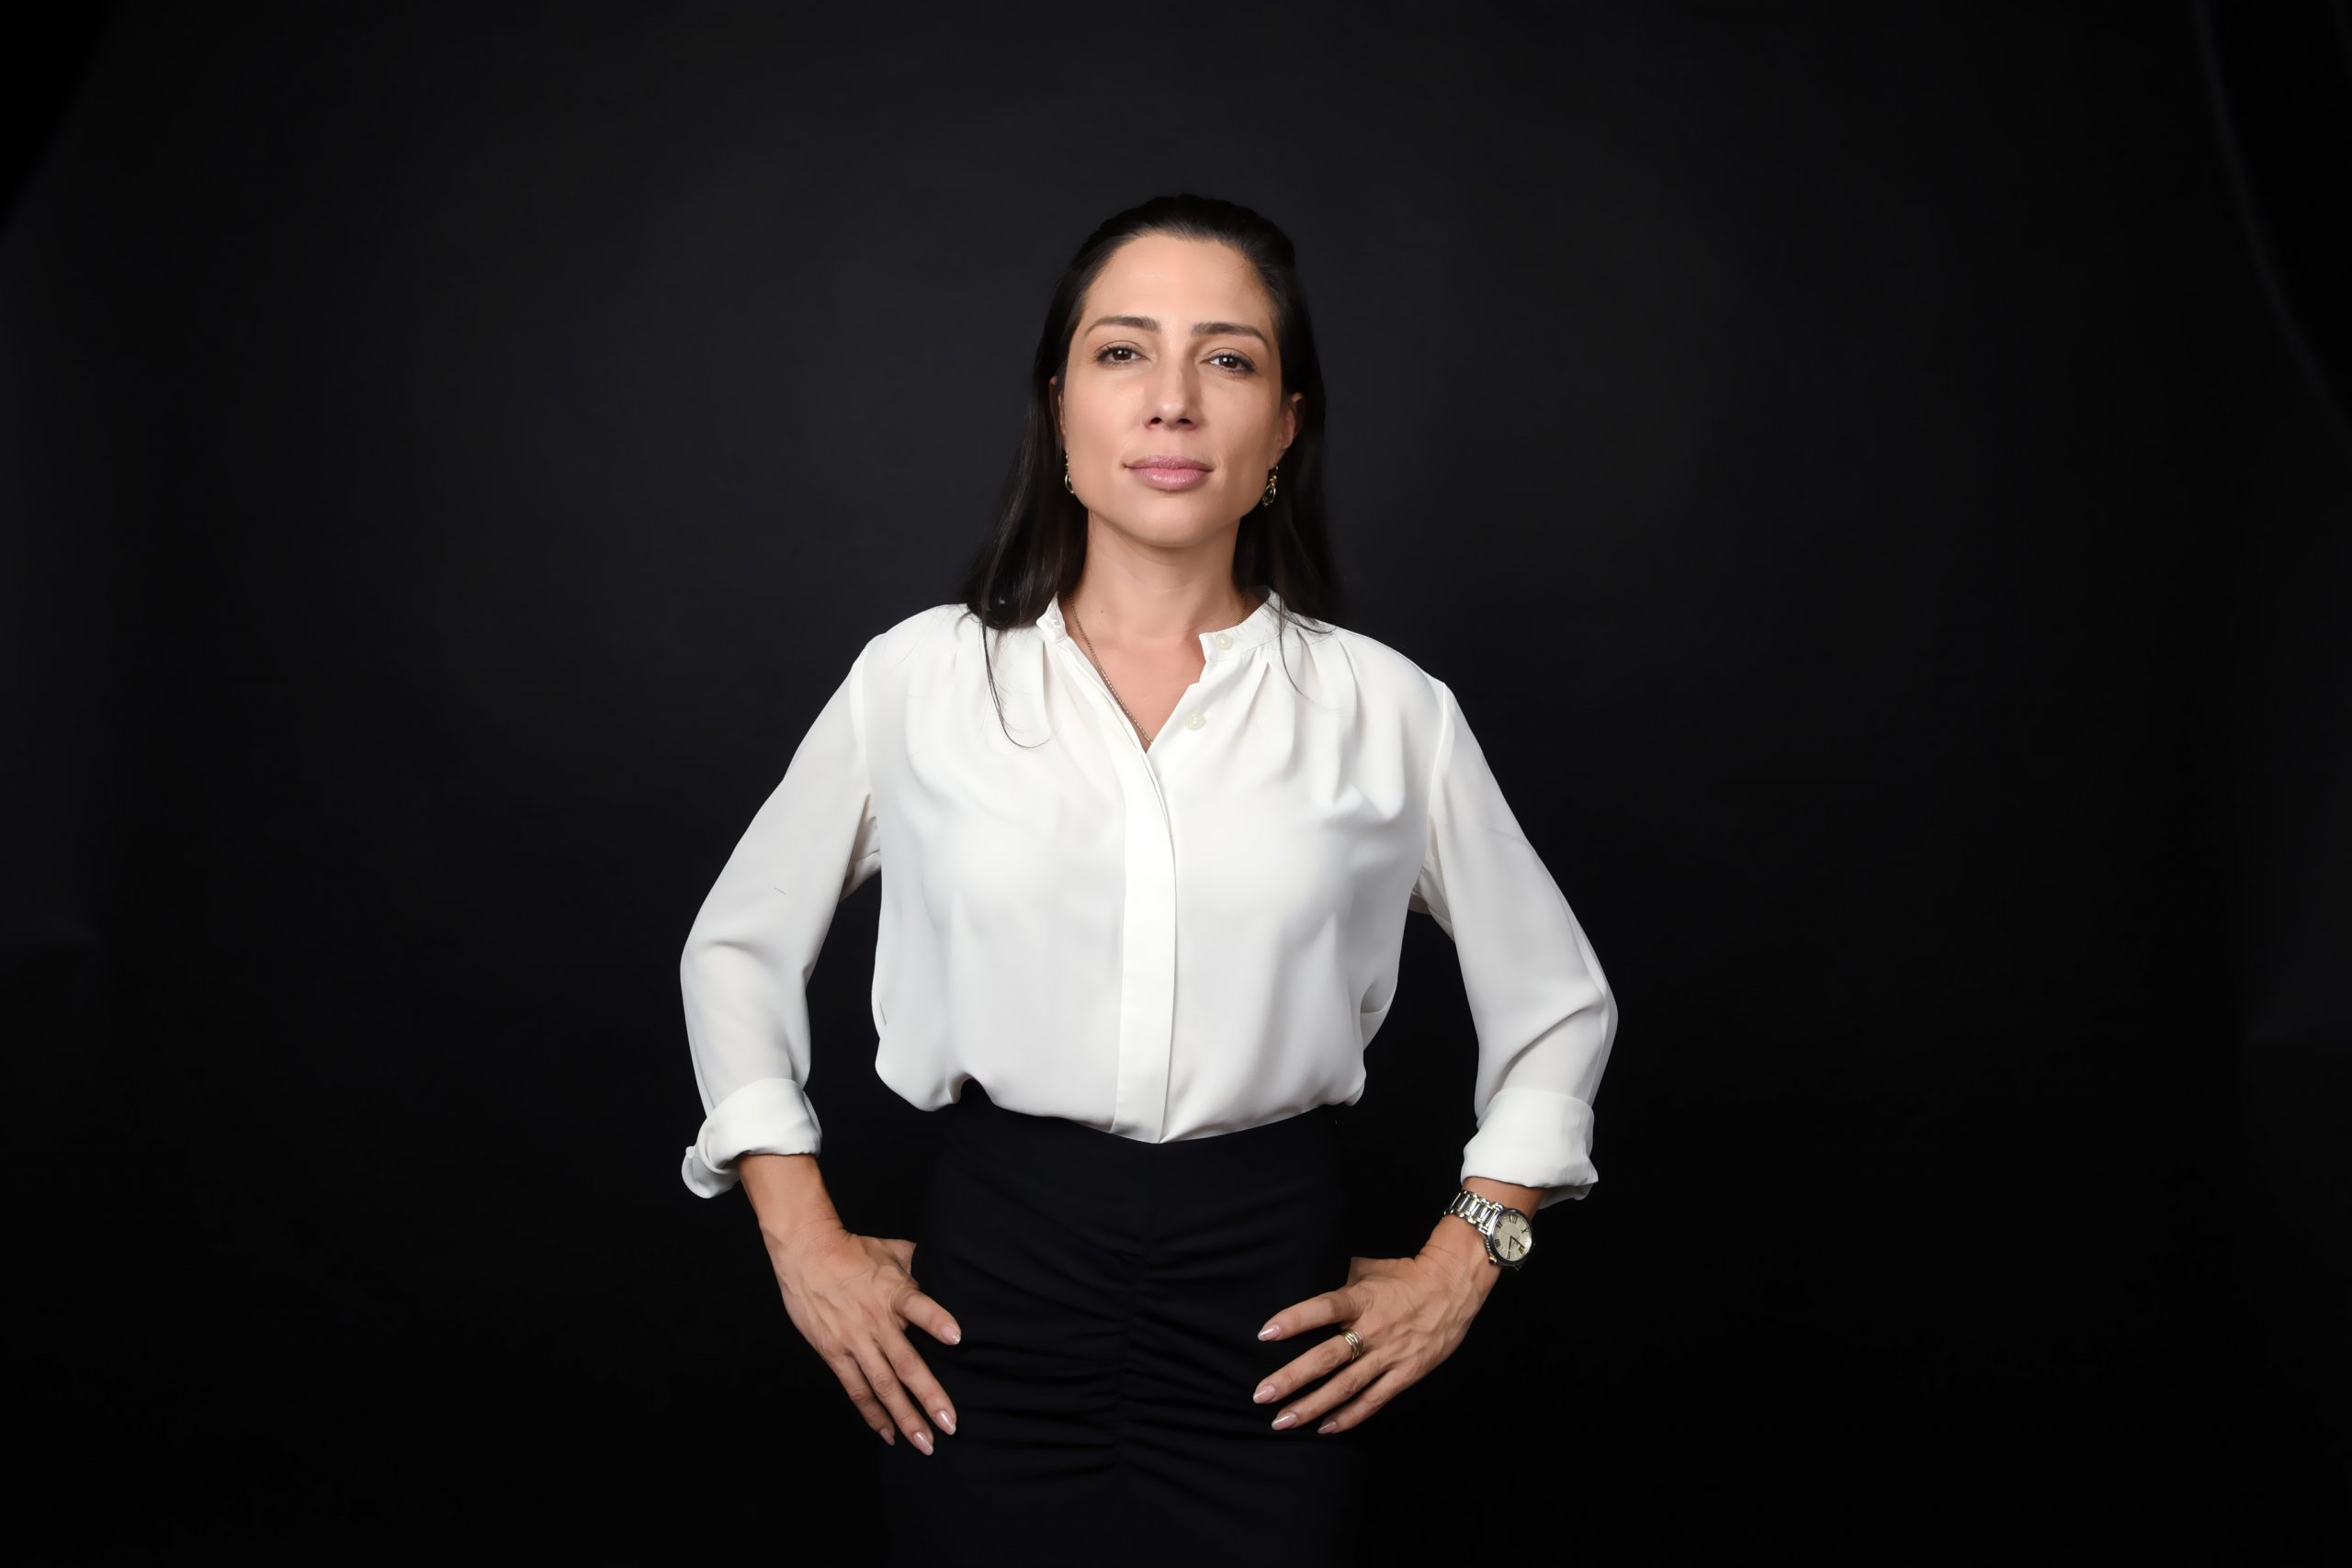 Alexandra-Lúgaro-3